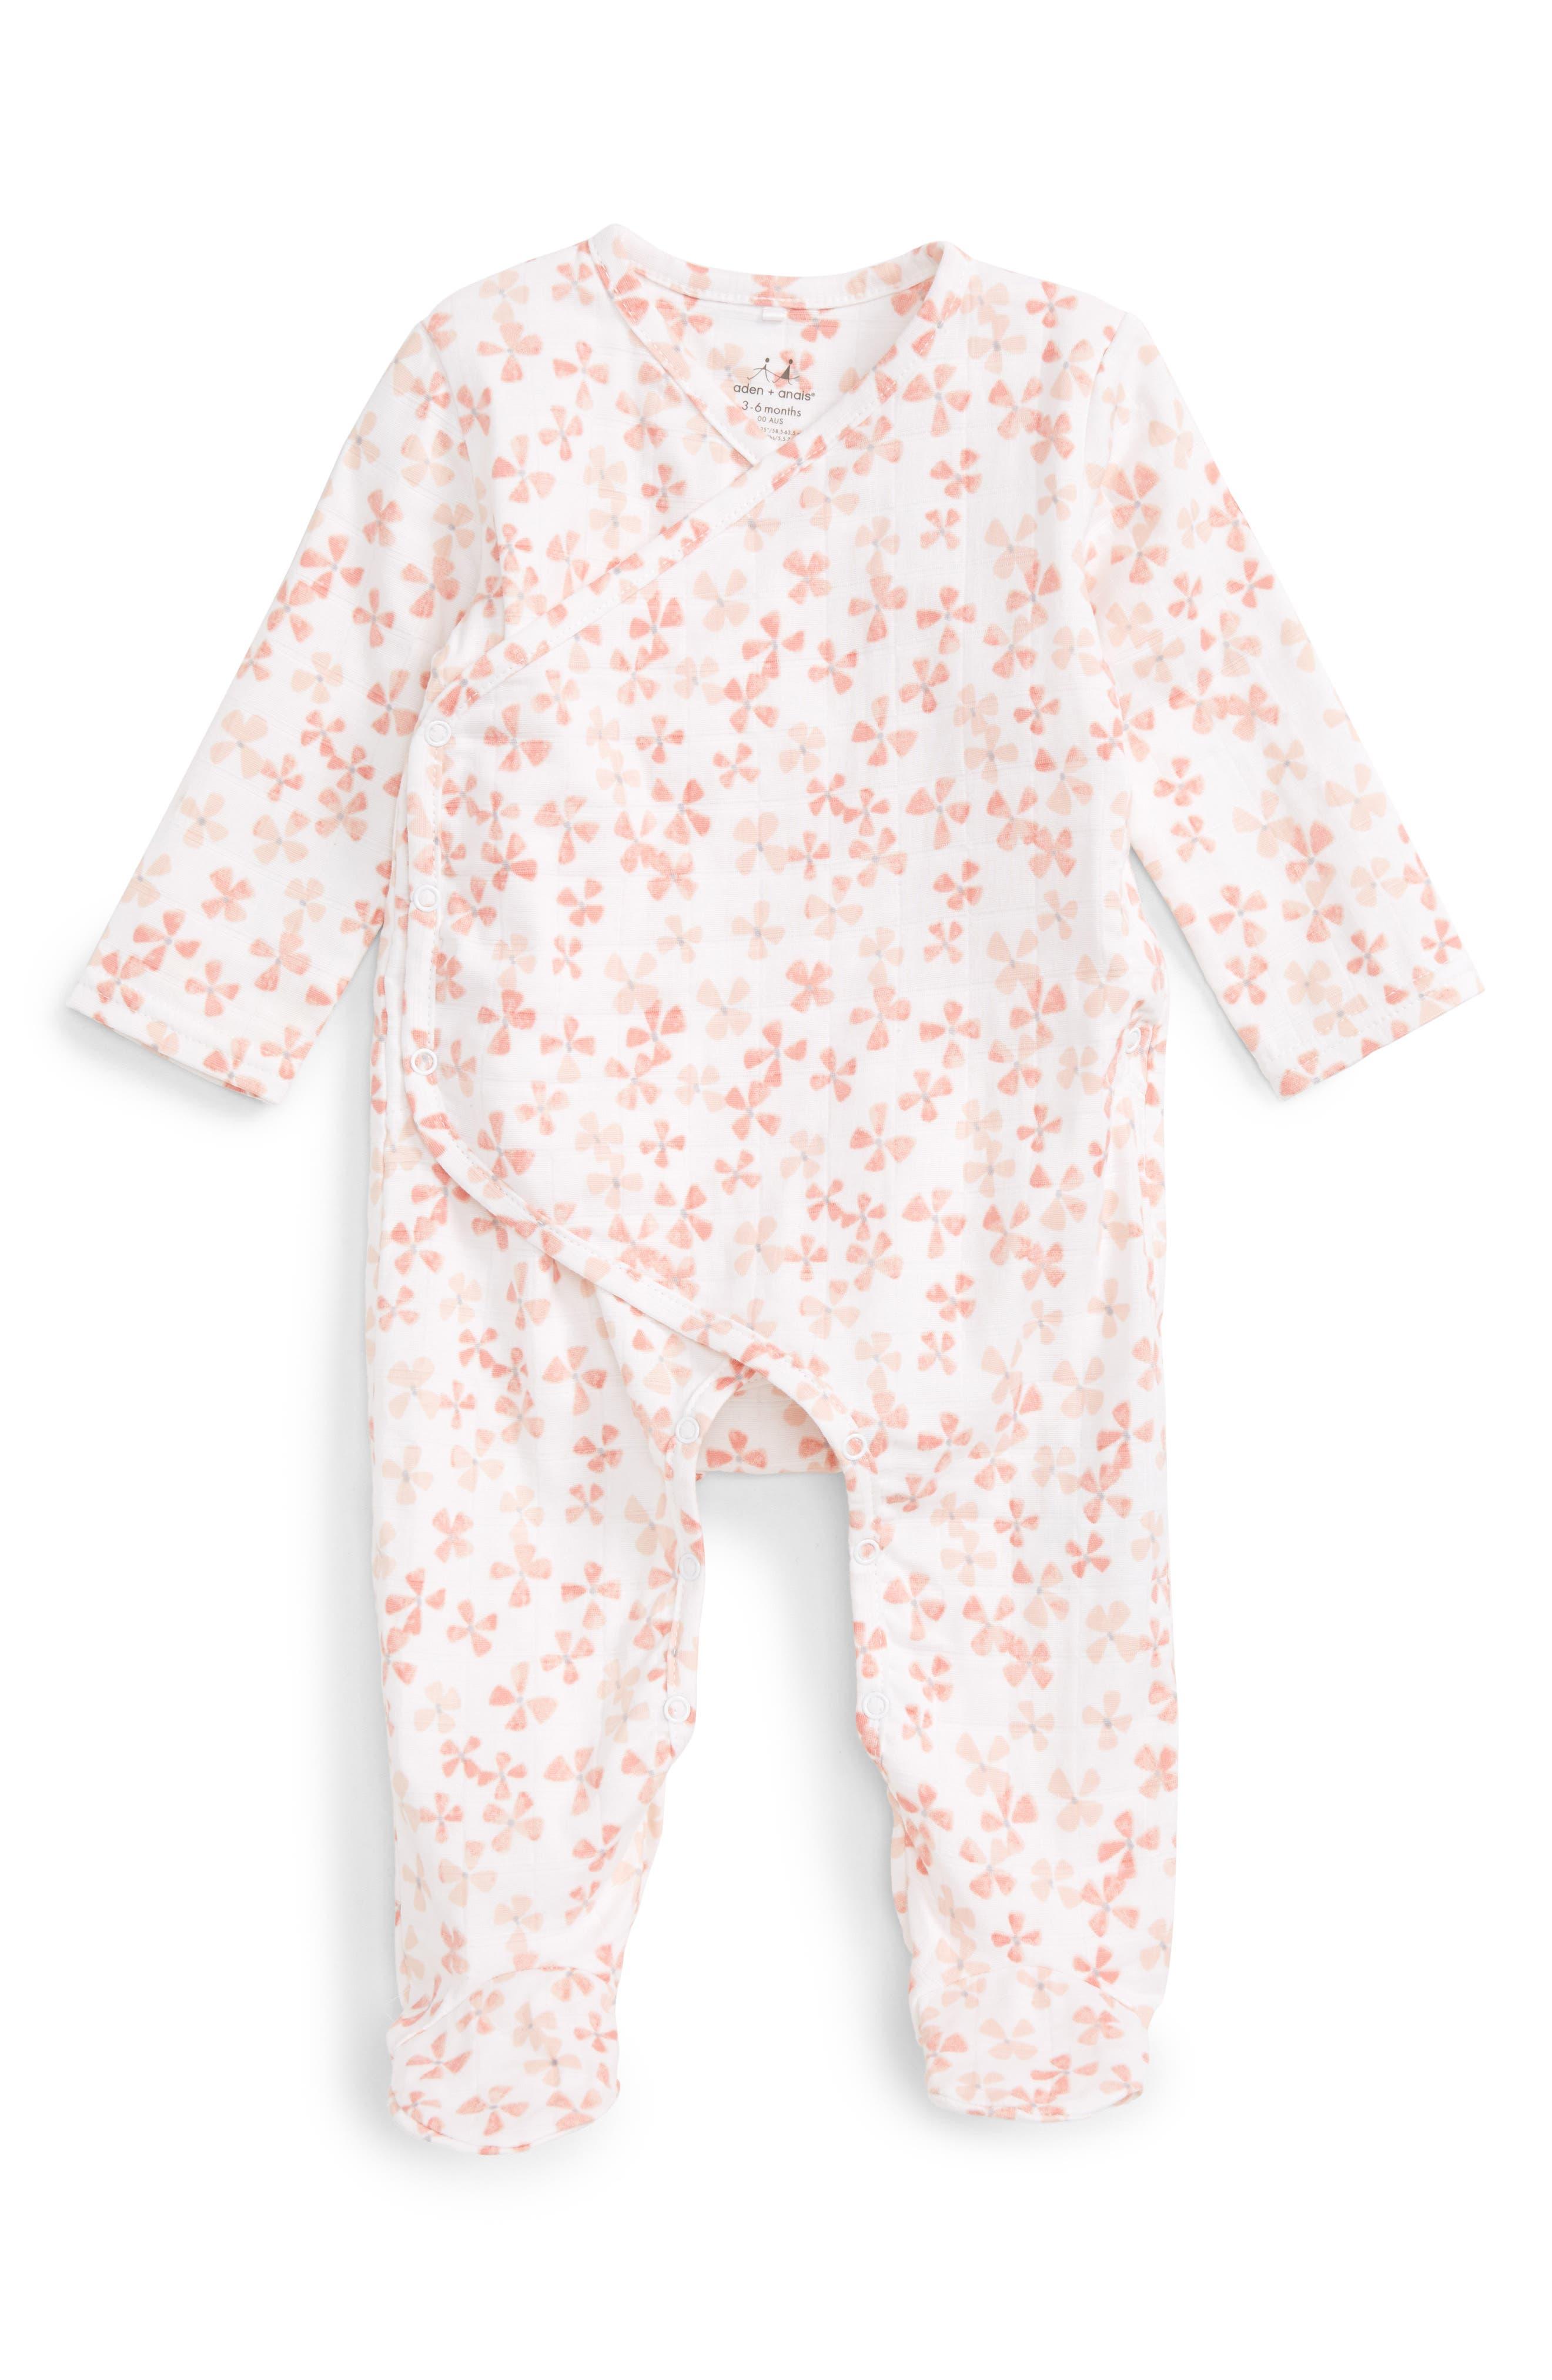 Aden + Anais Print Wrap Romper (Baby Girls)